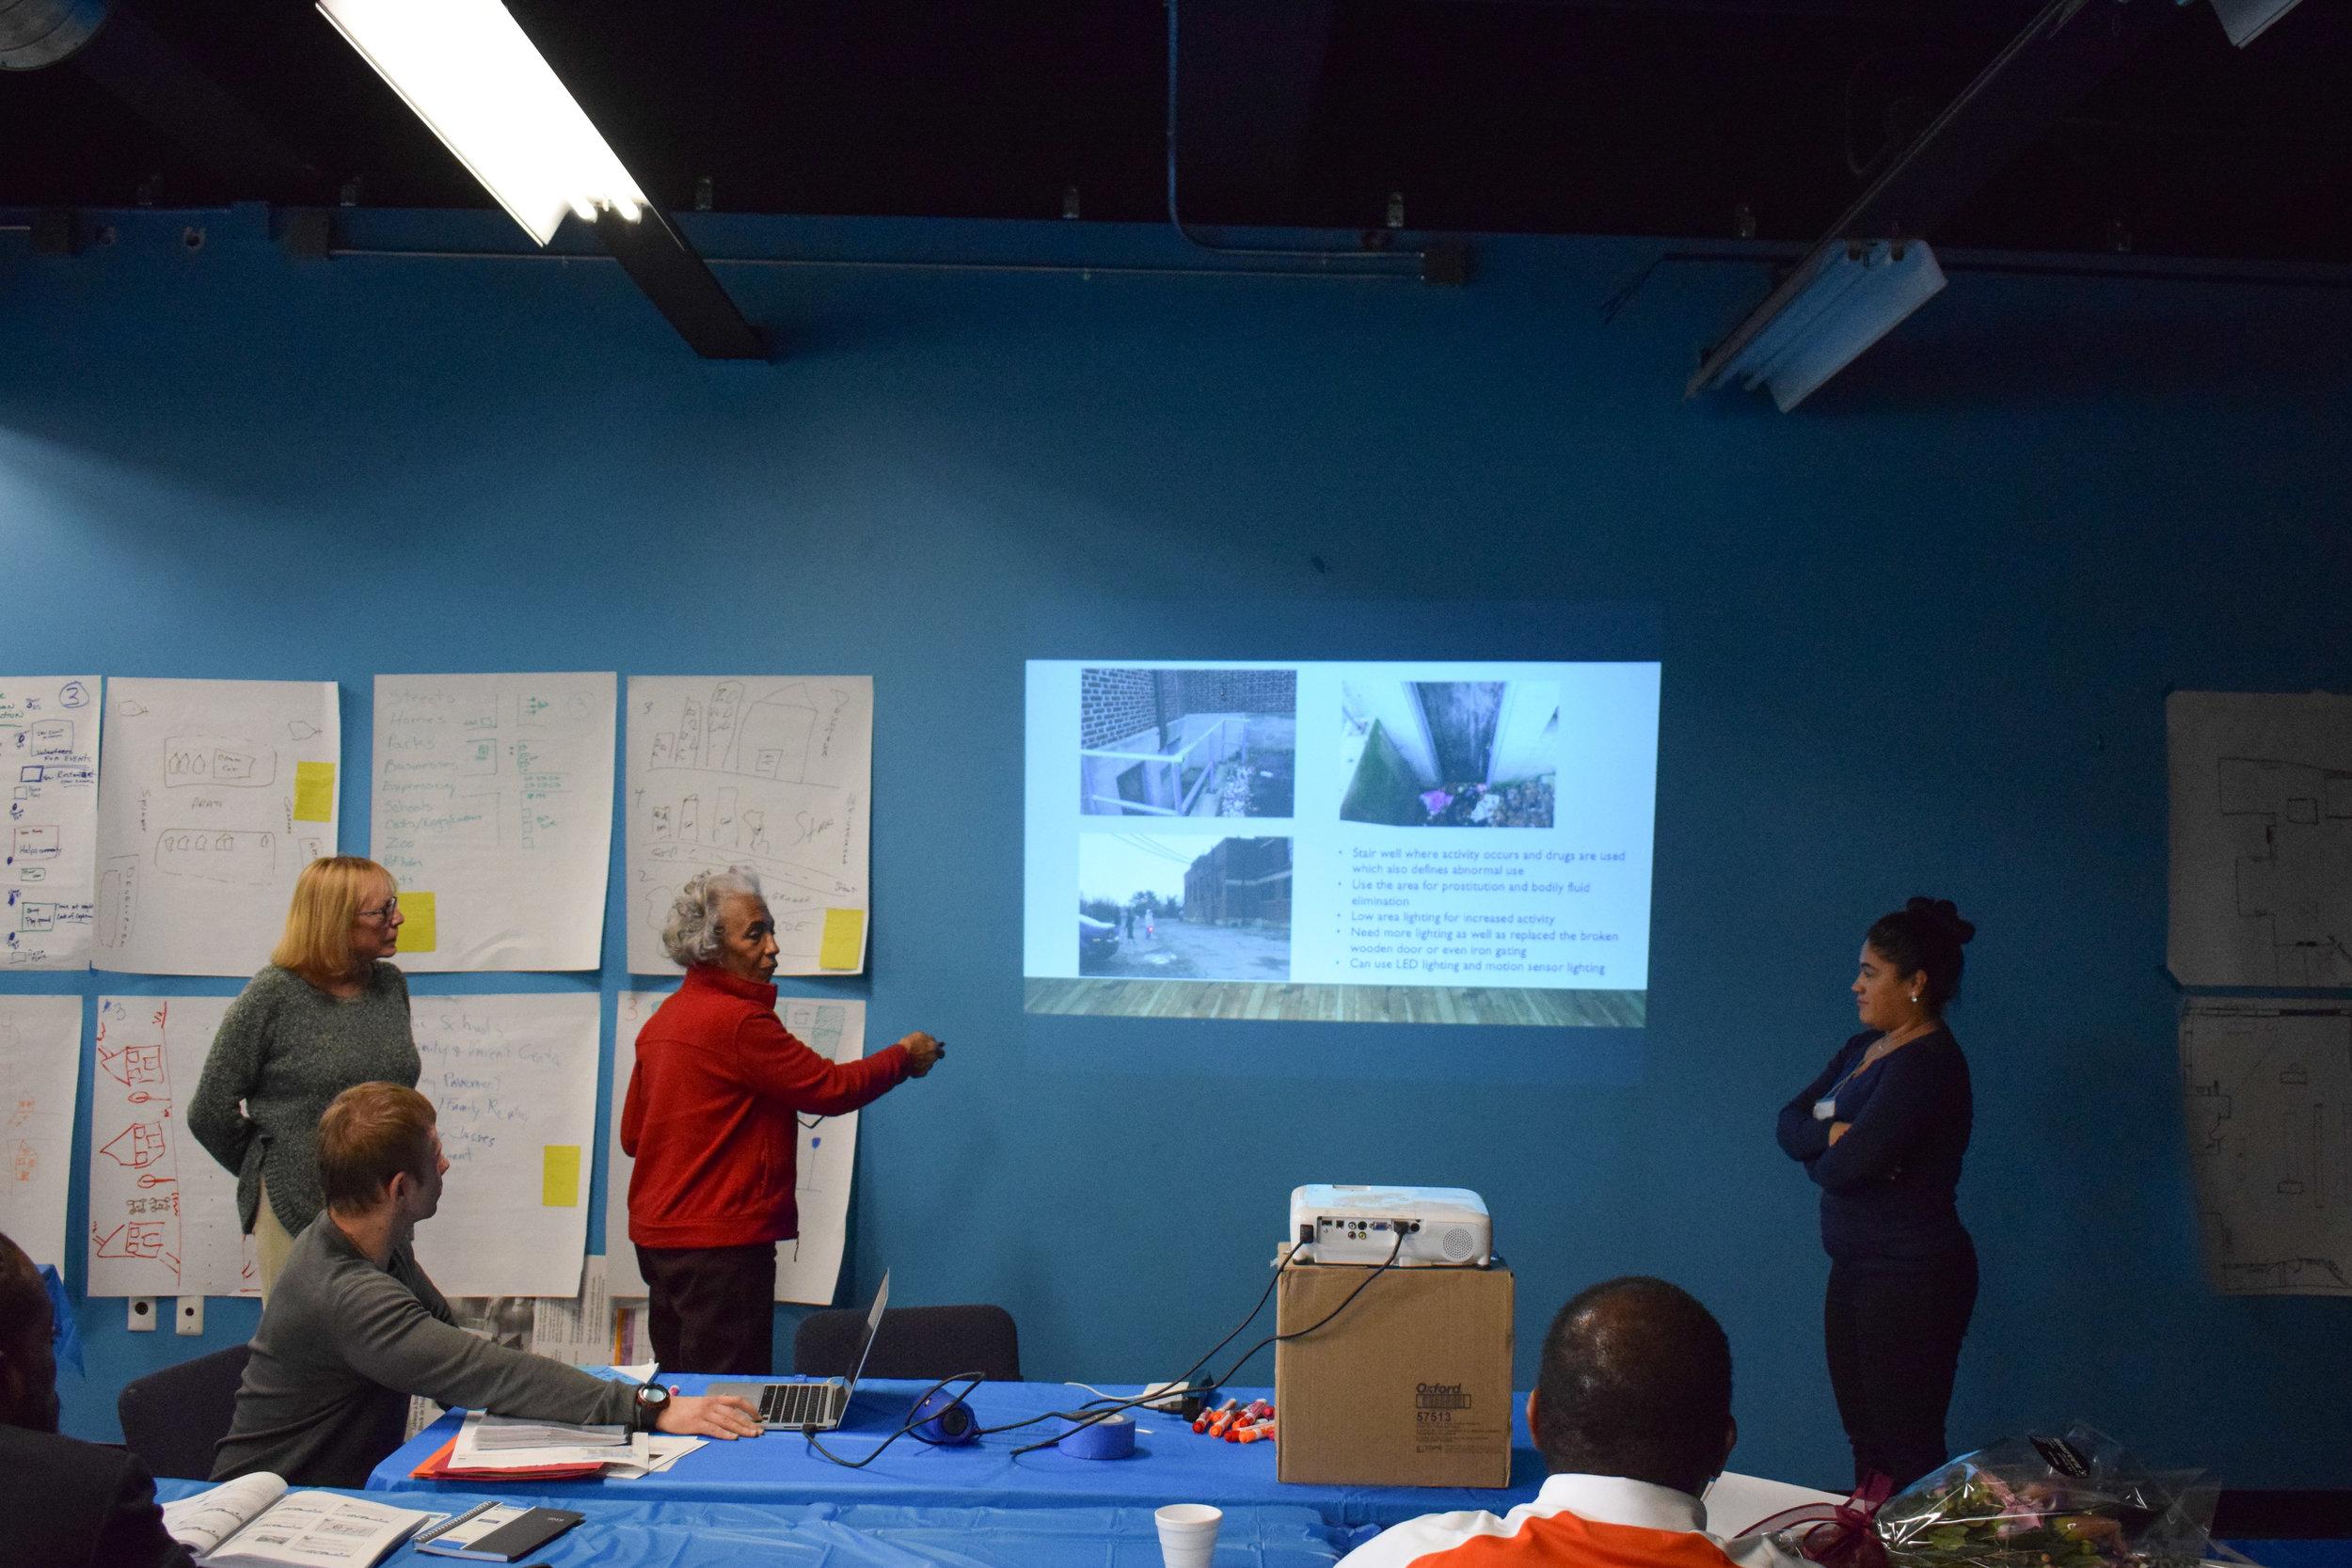 Burlington Avenue Block Club leaders brainstorming neighborhood safety strategies in a Crime Prevention Through Environmental Design workshop